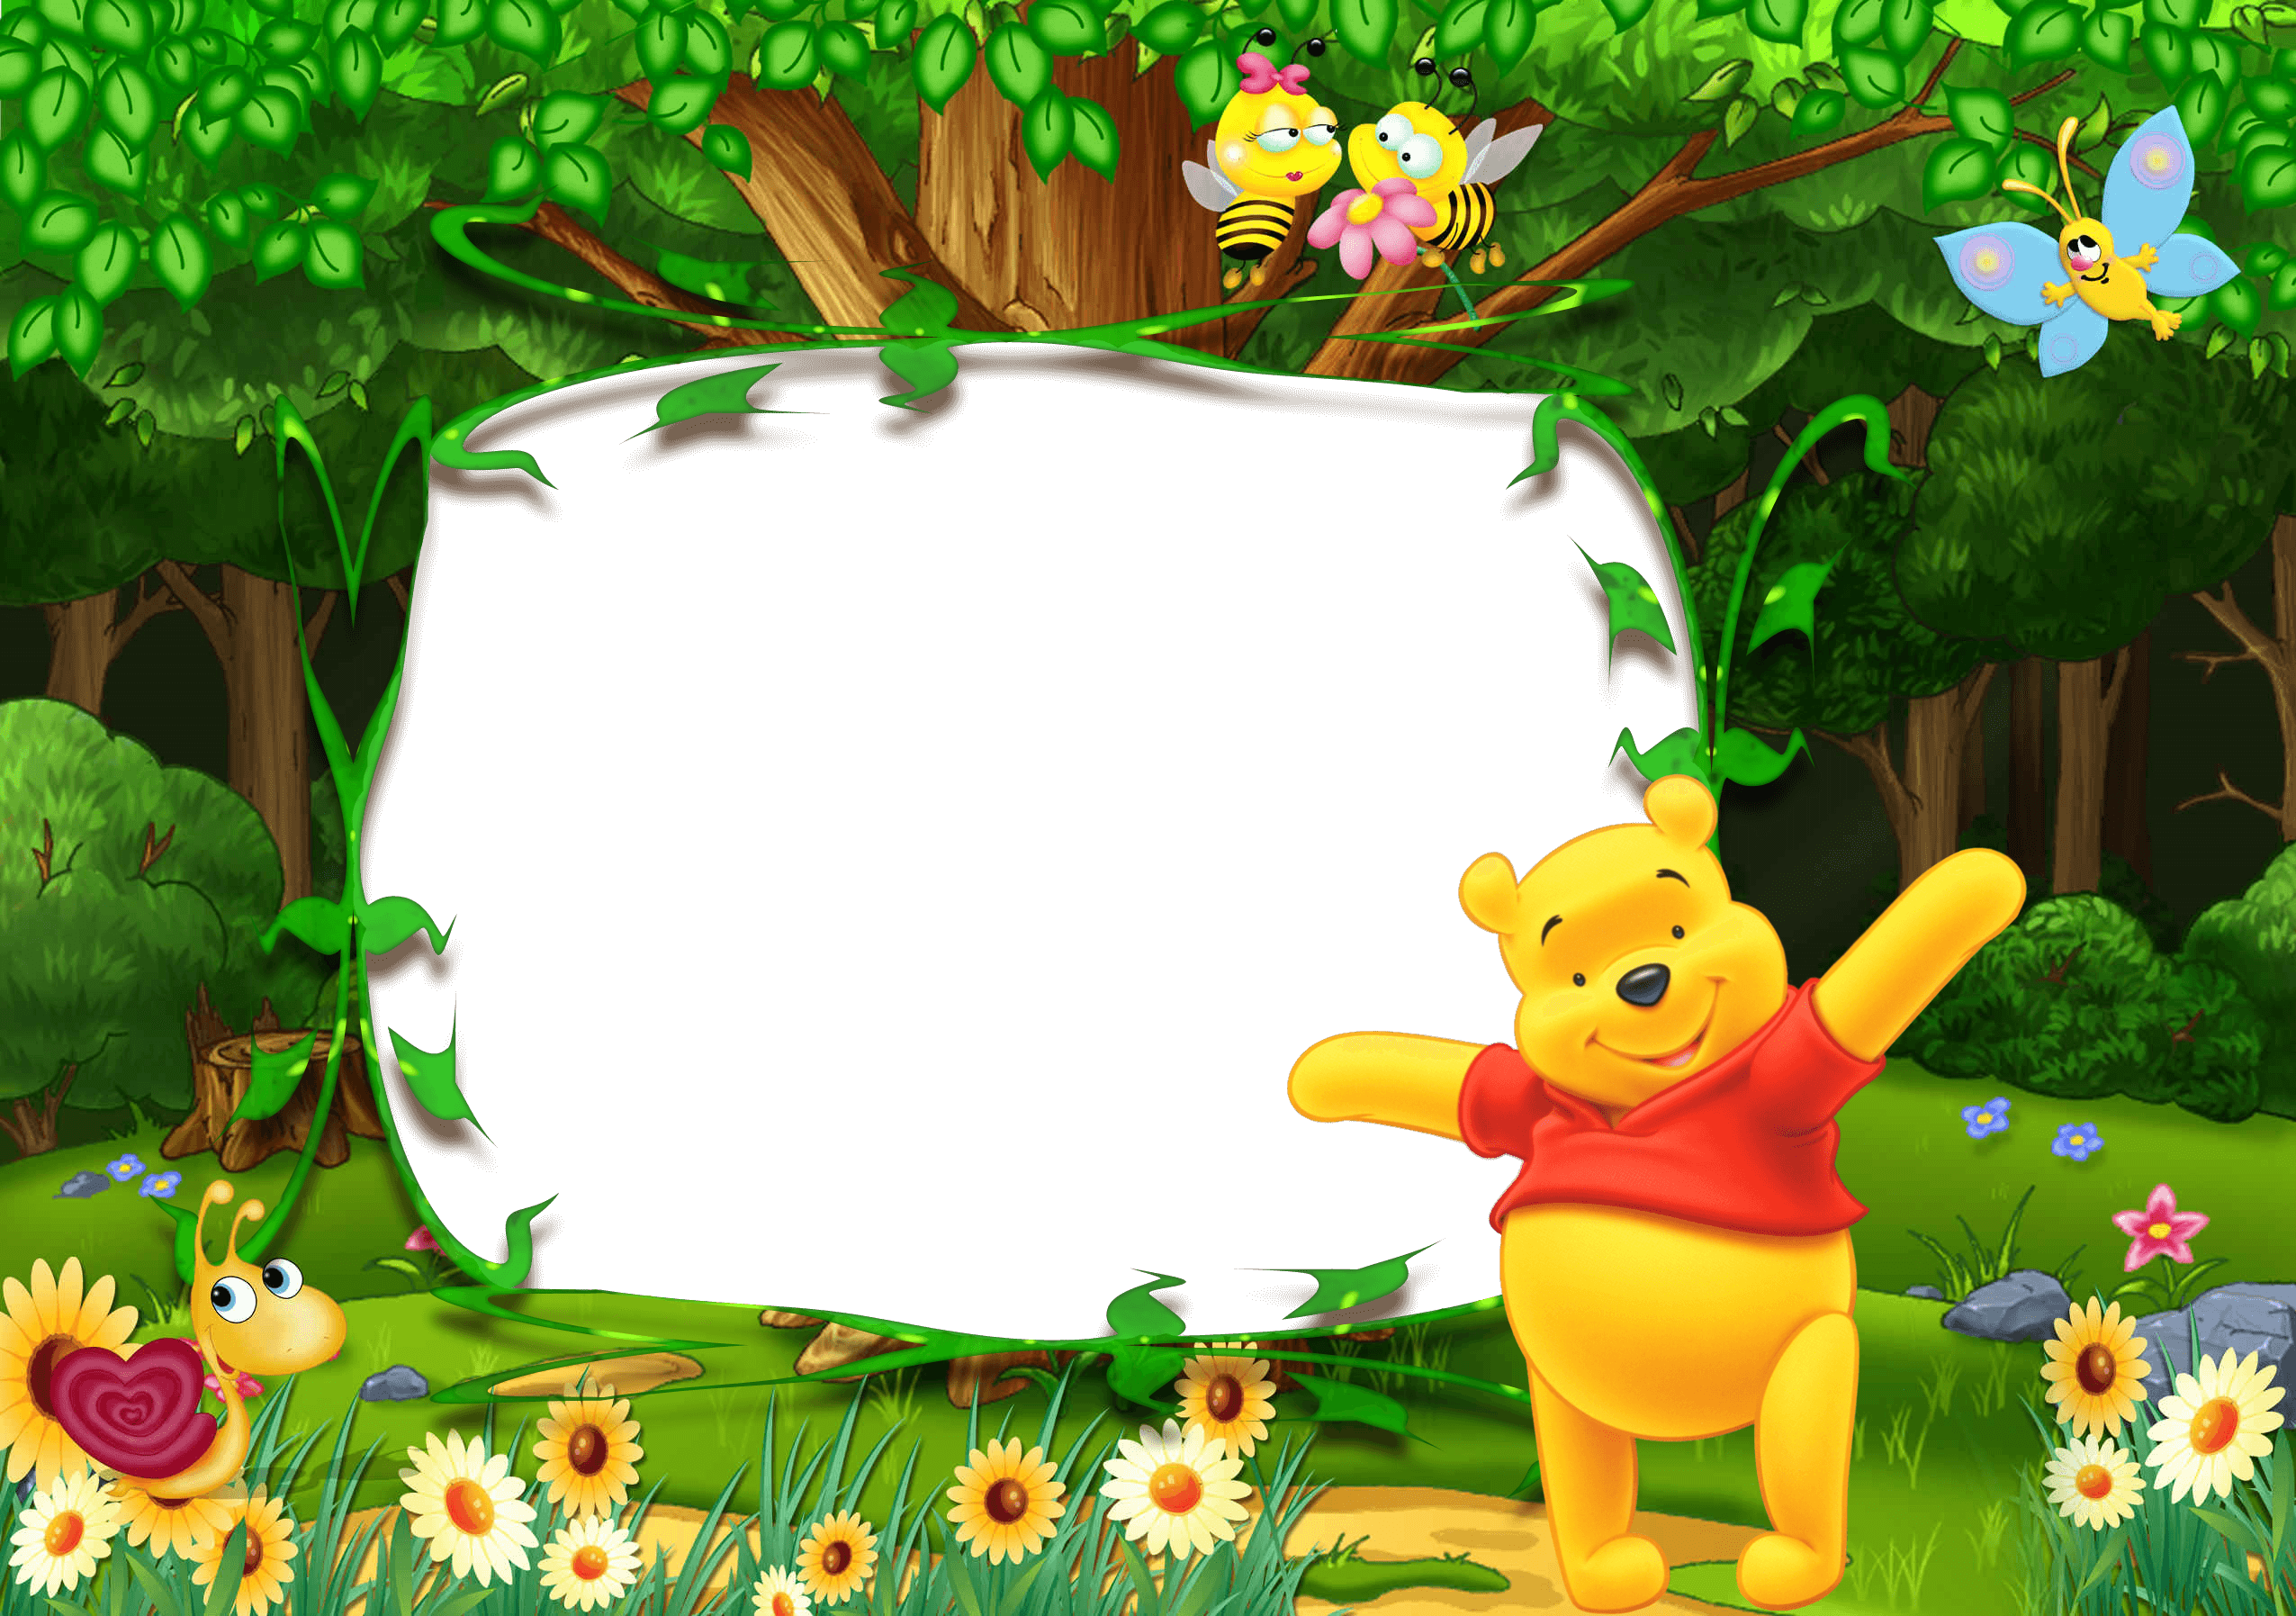 Marco De Foto Winnie The Pooh f  - Marco De Foto Winnie The Pooh f